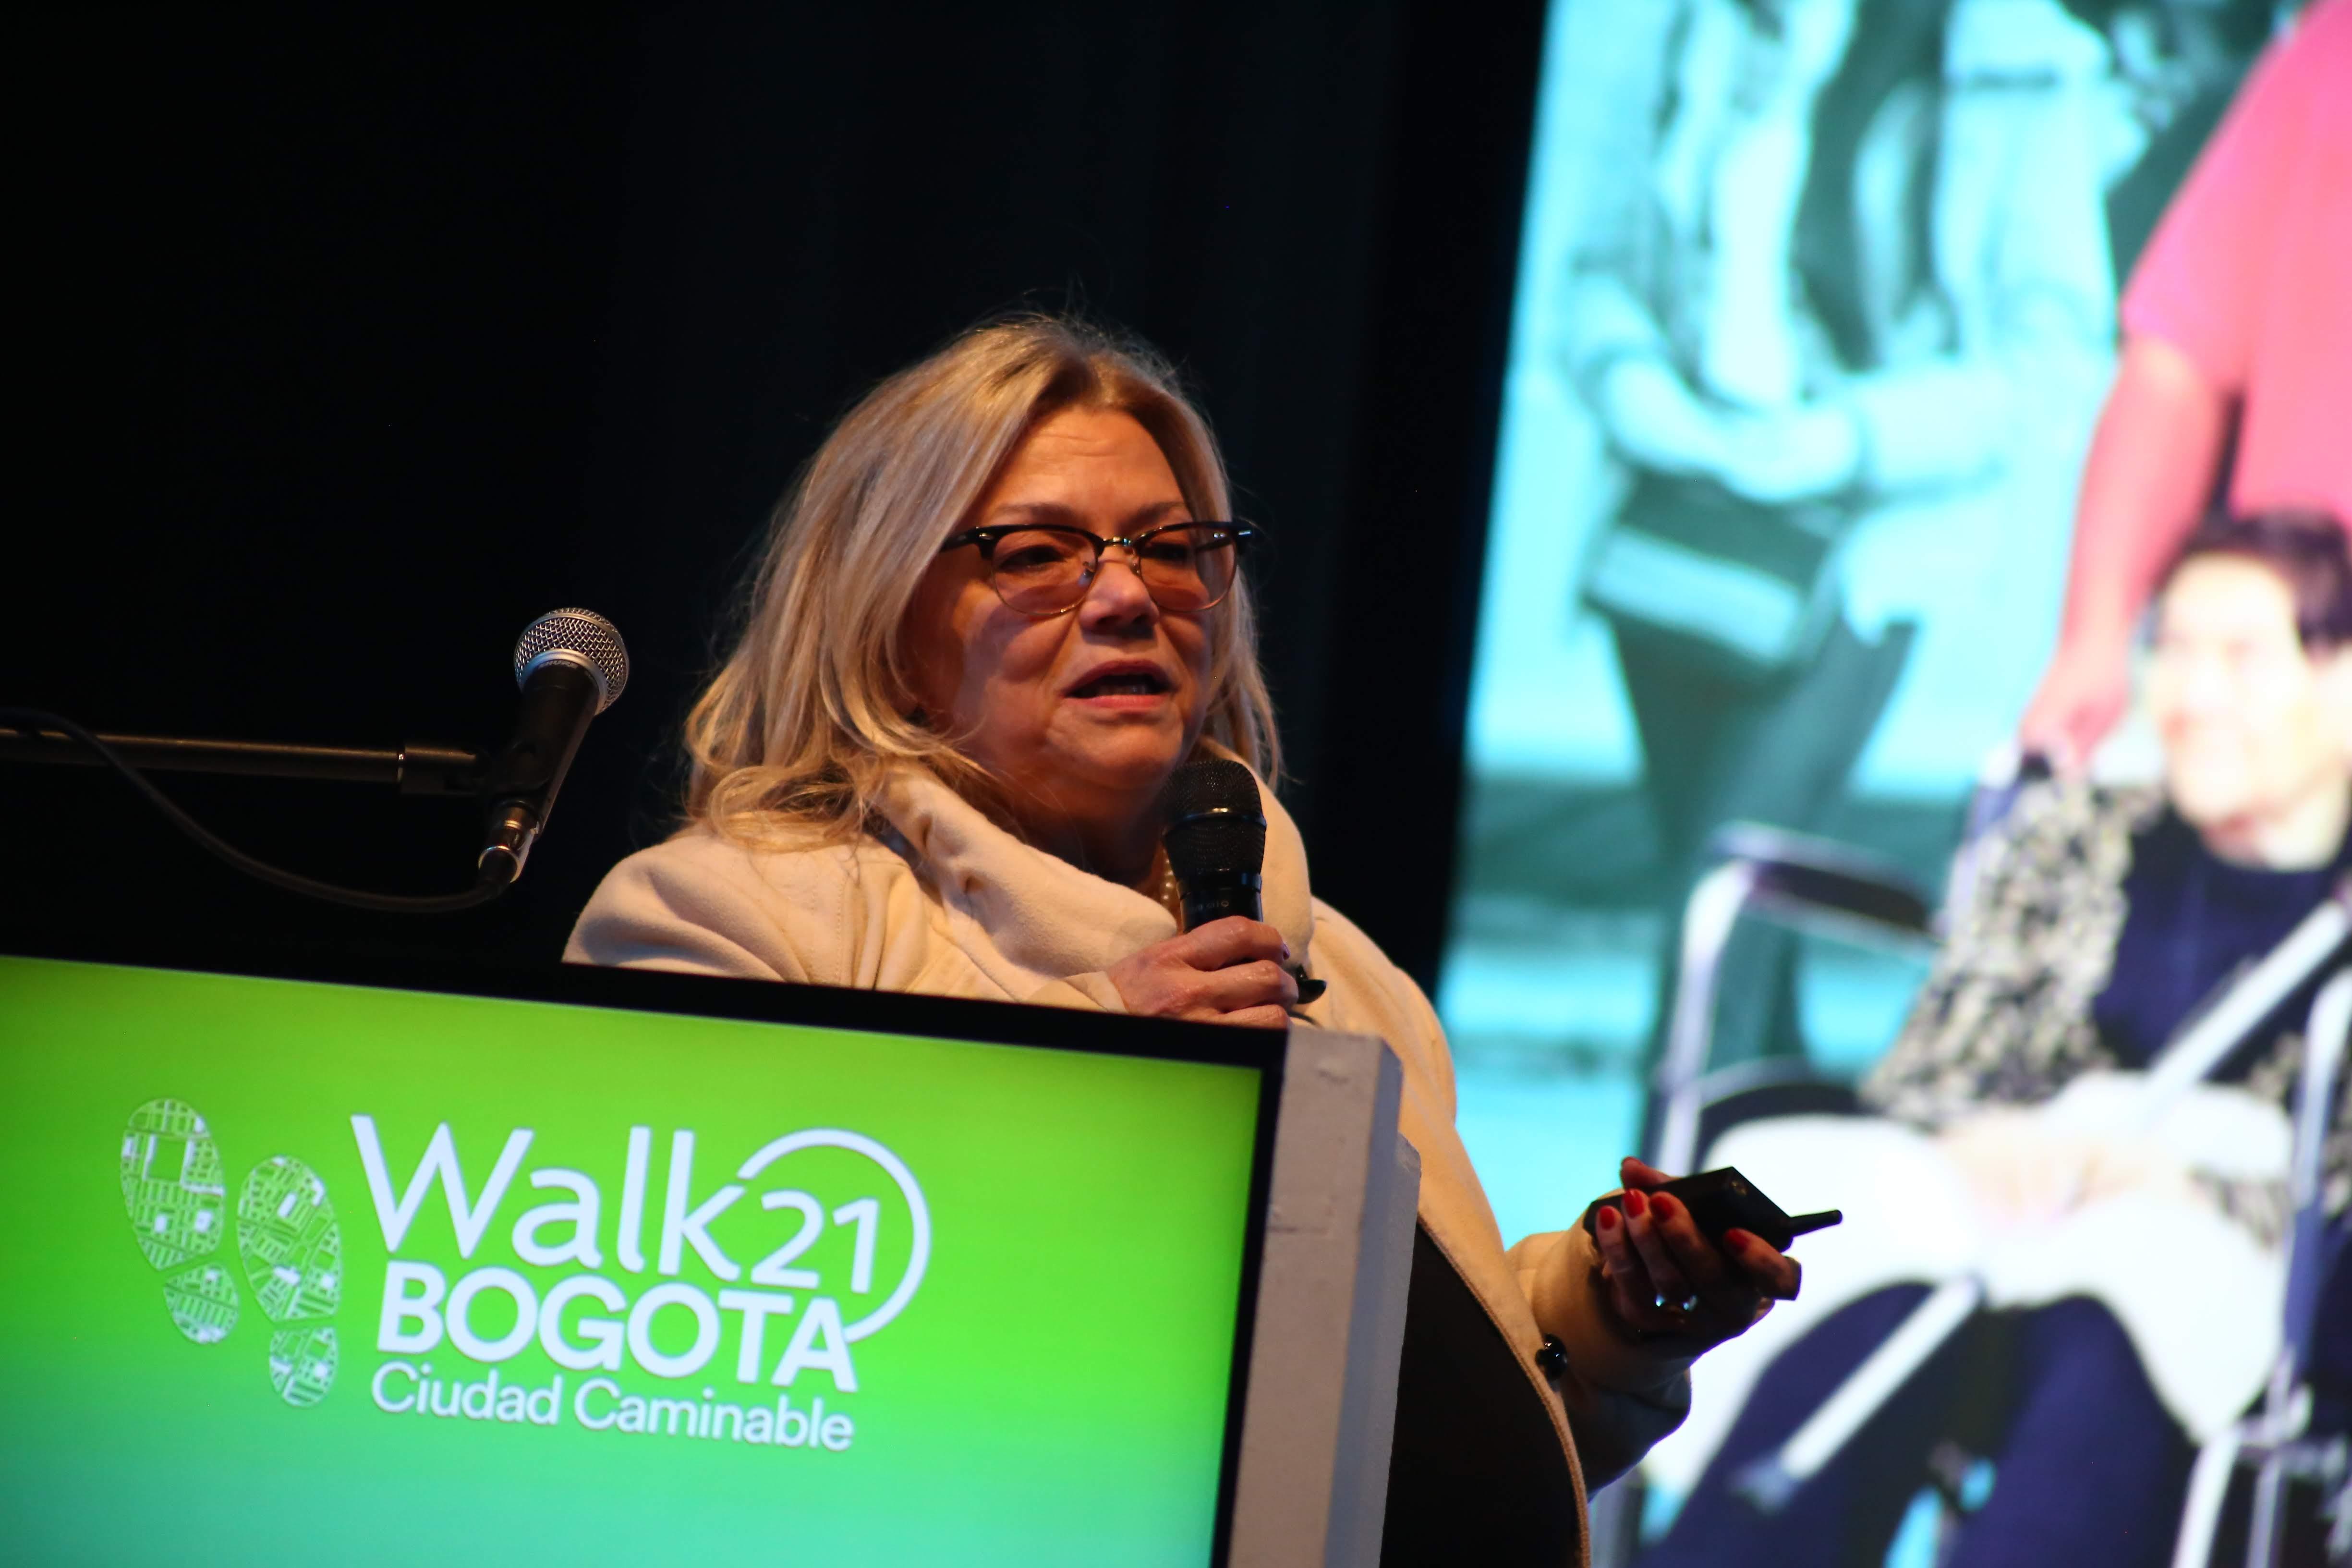 Walk21 Bogota conference speakers